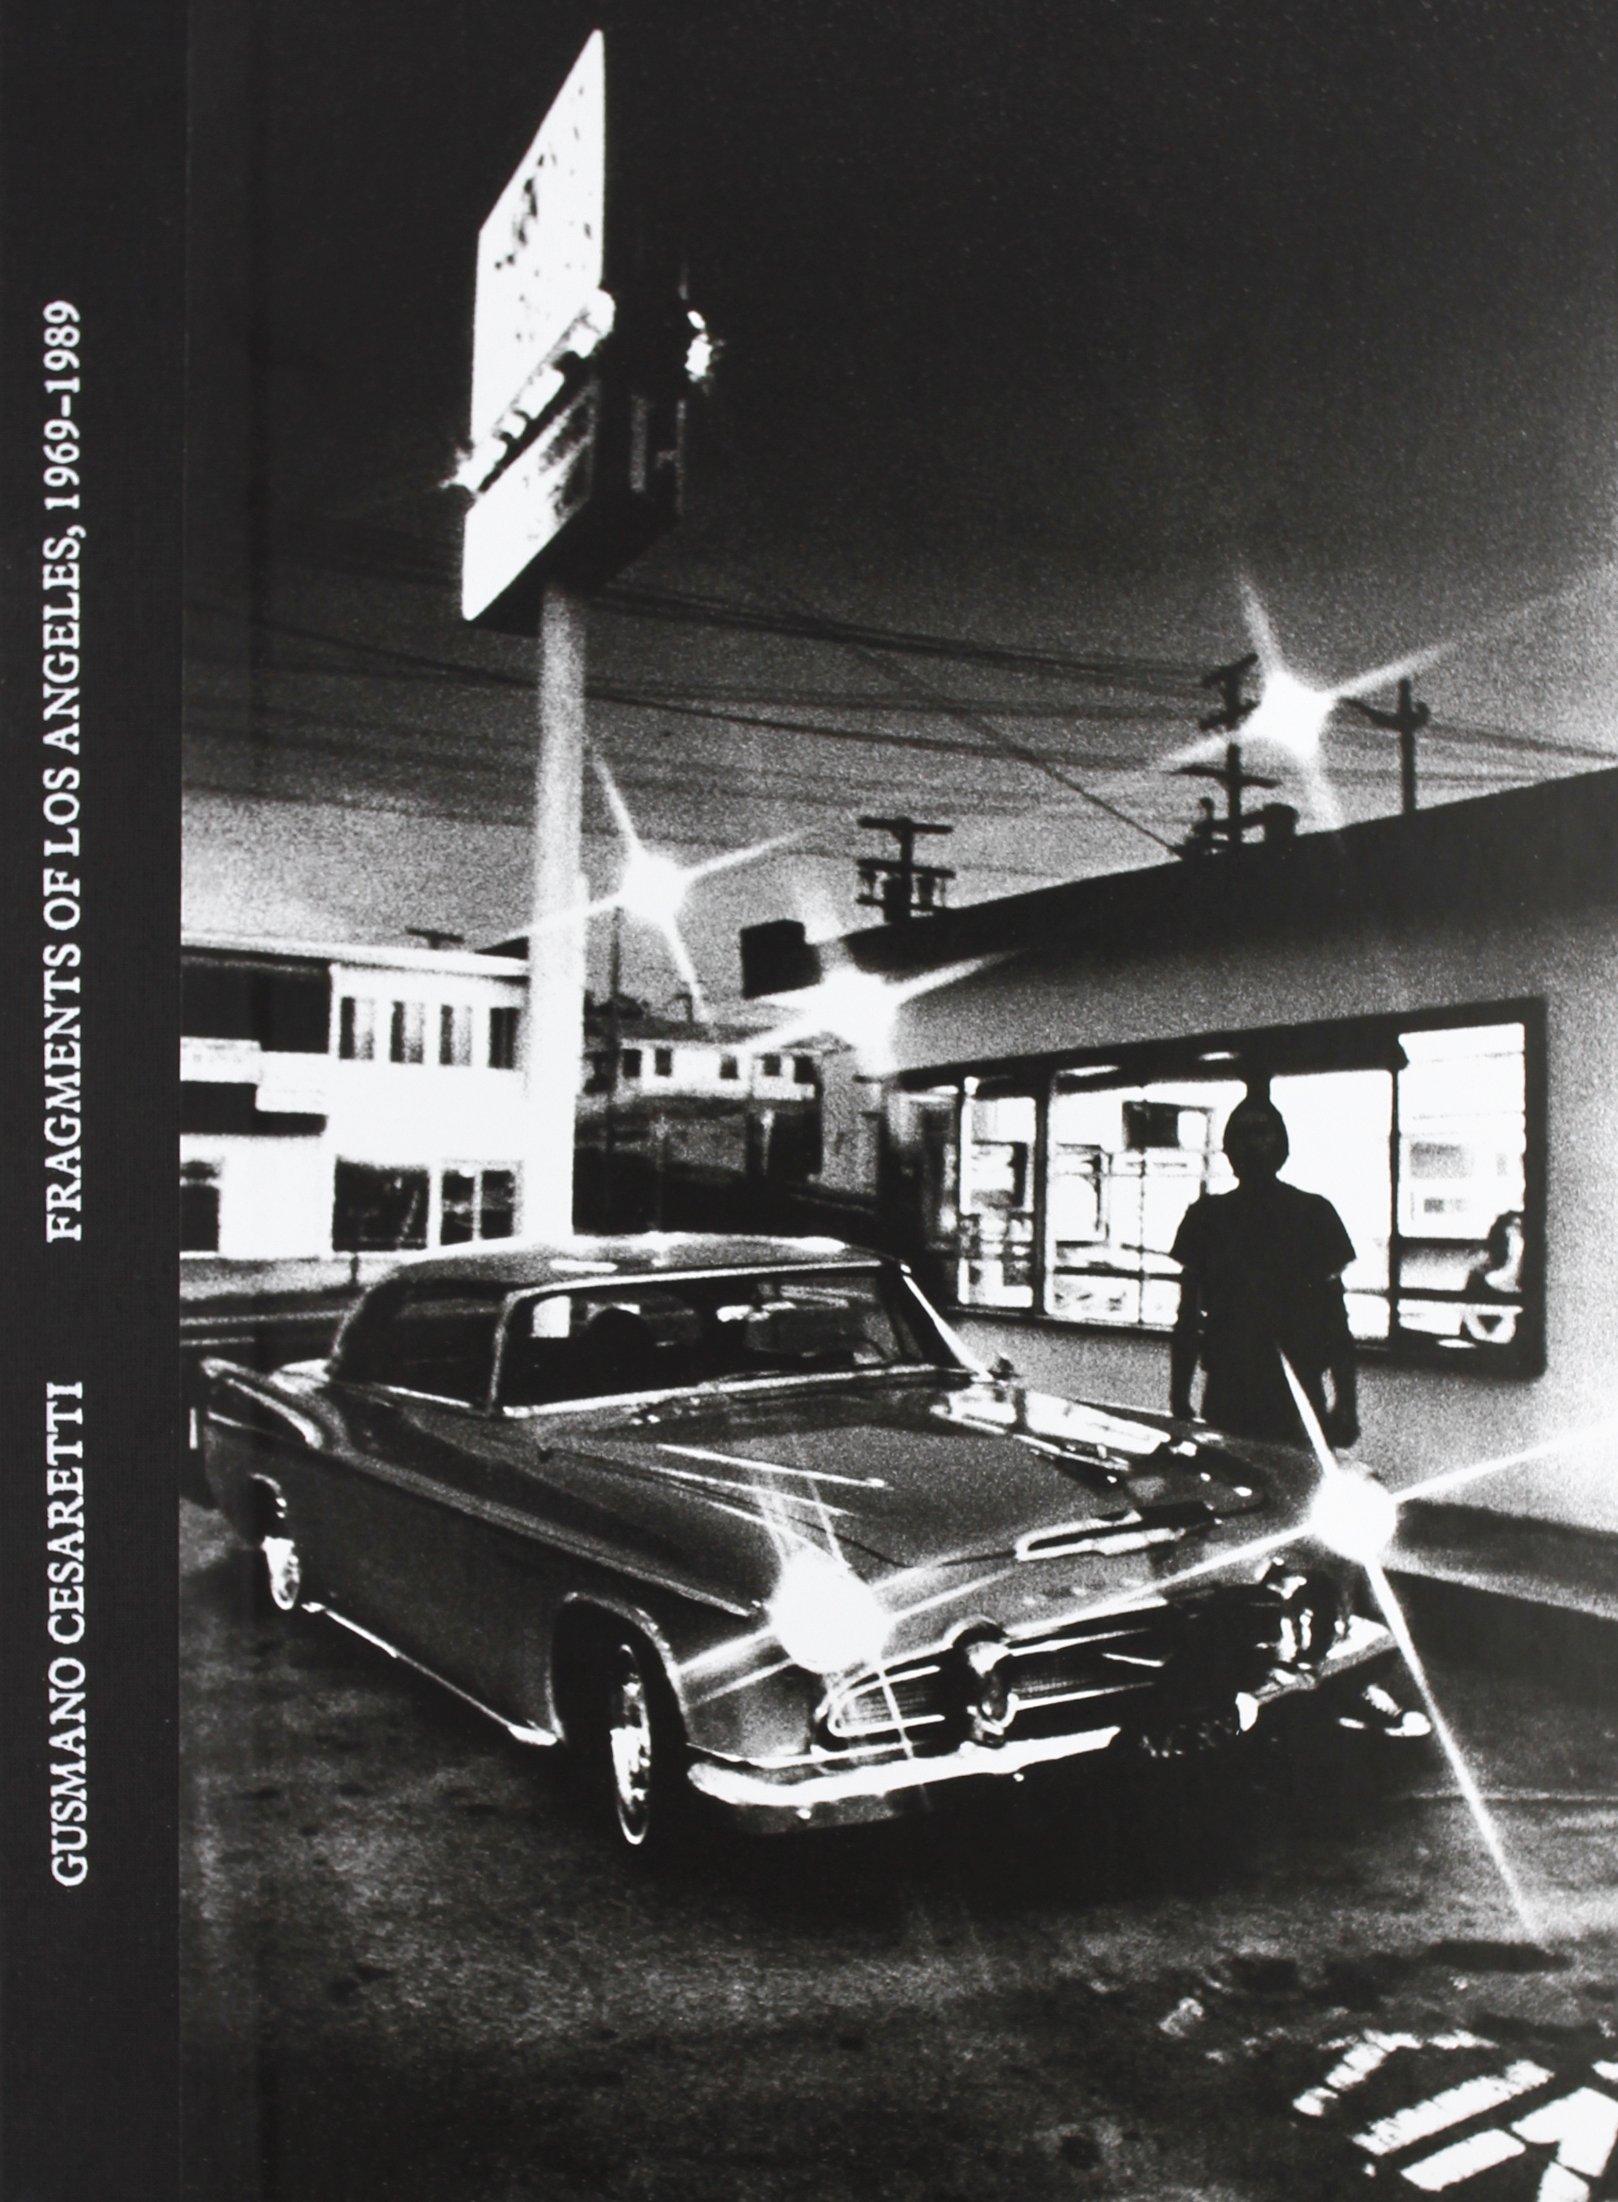 Download Gusmano Cesaretti: Fragments of Los Angeles 1969-1989 pdf epub